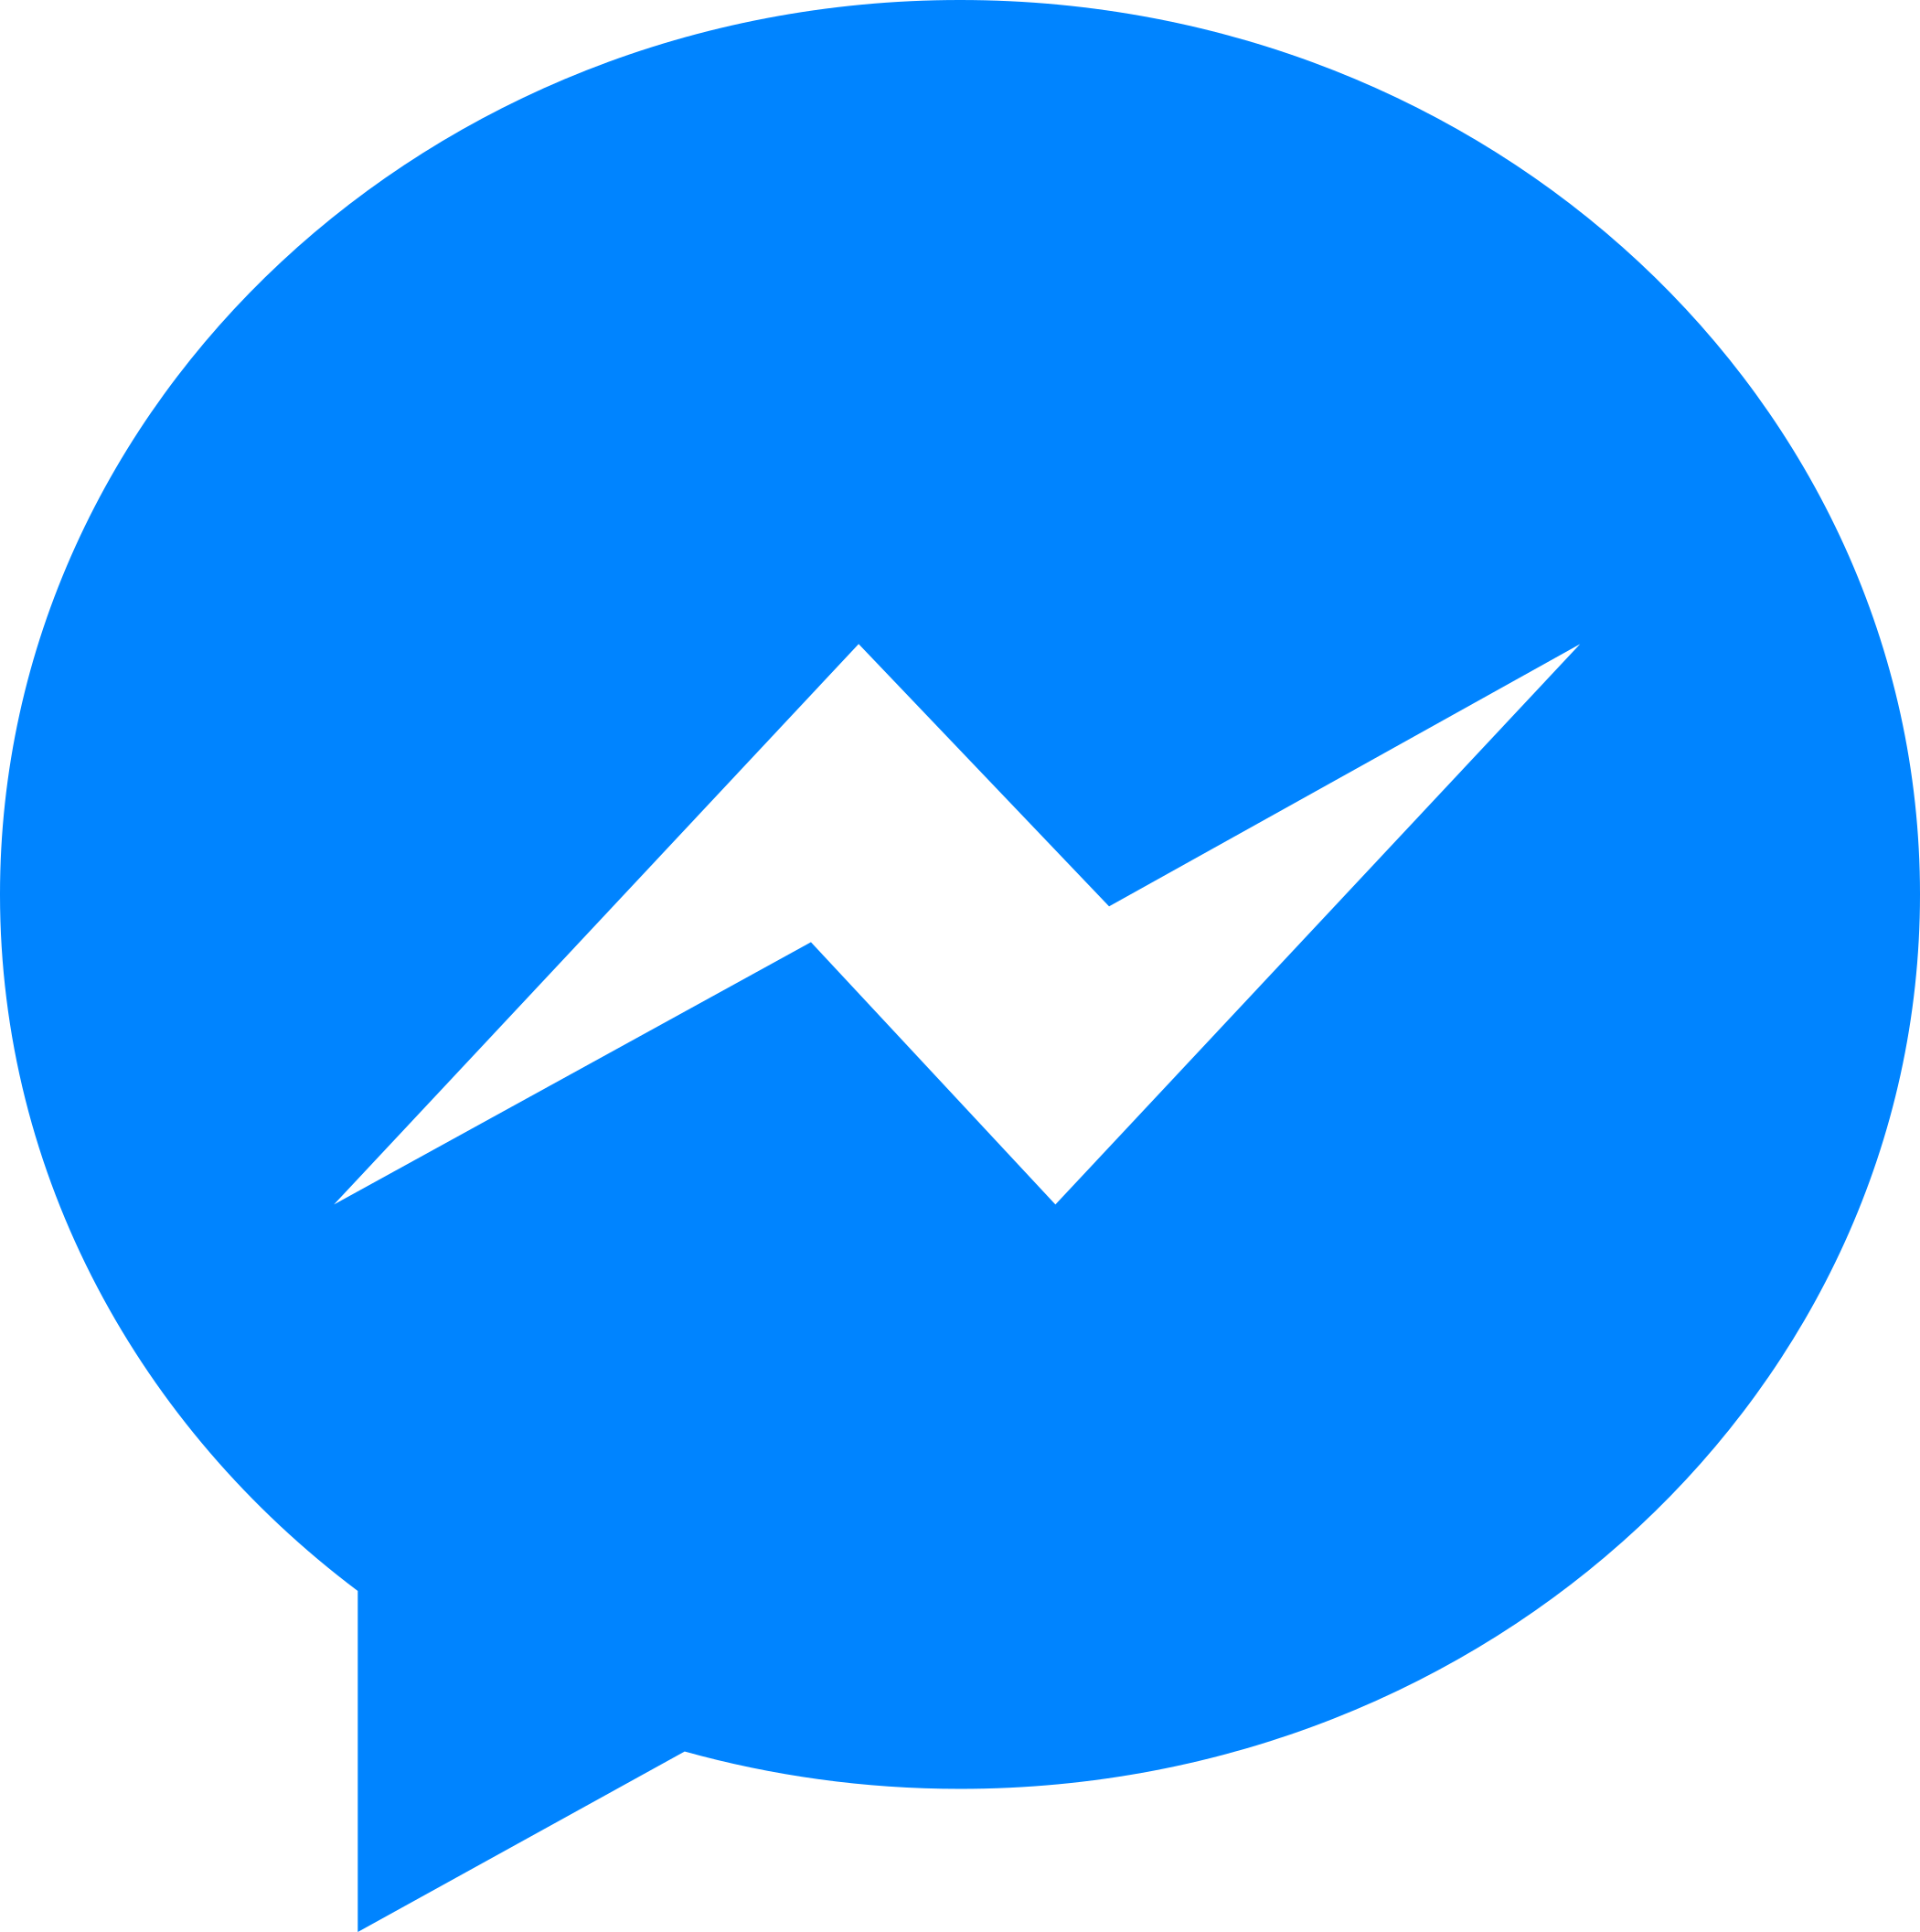 facebook-messenger-icone-1